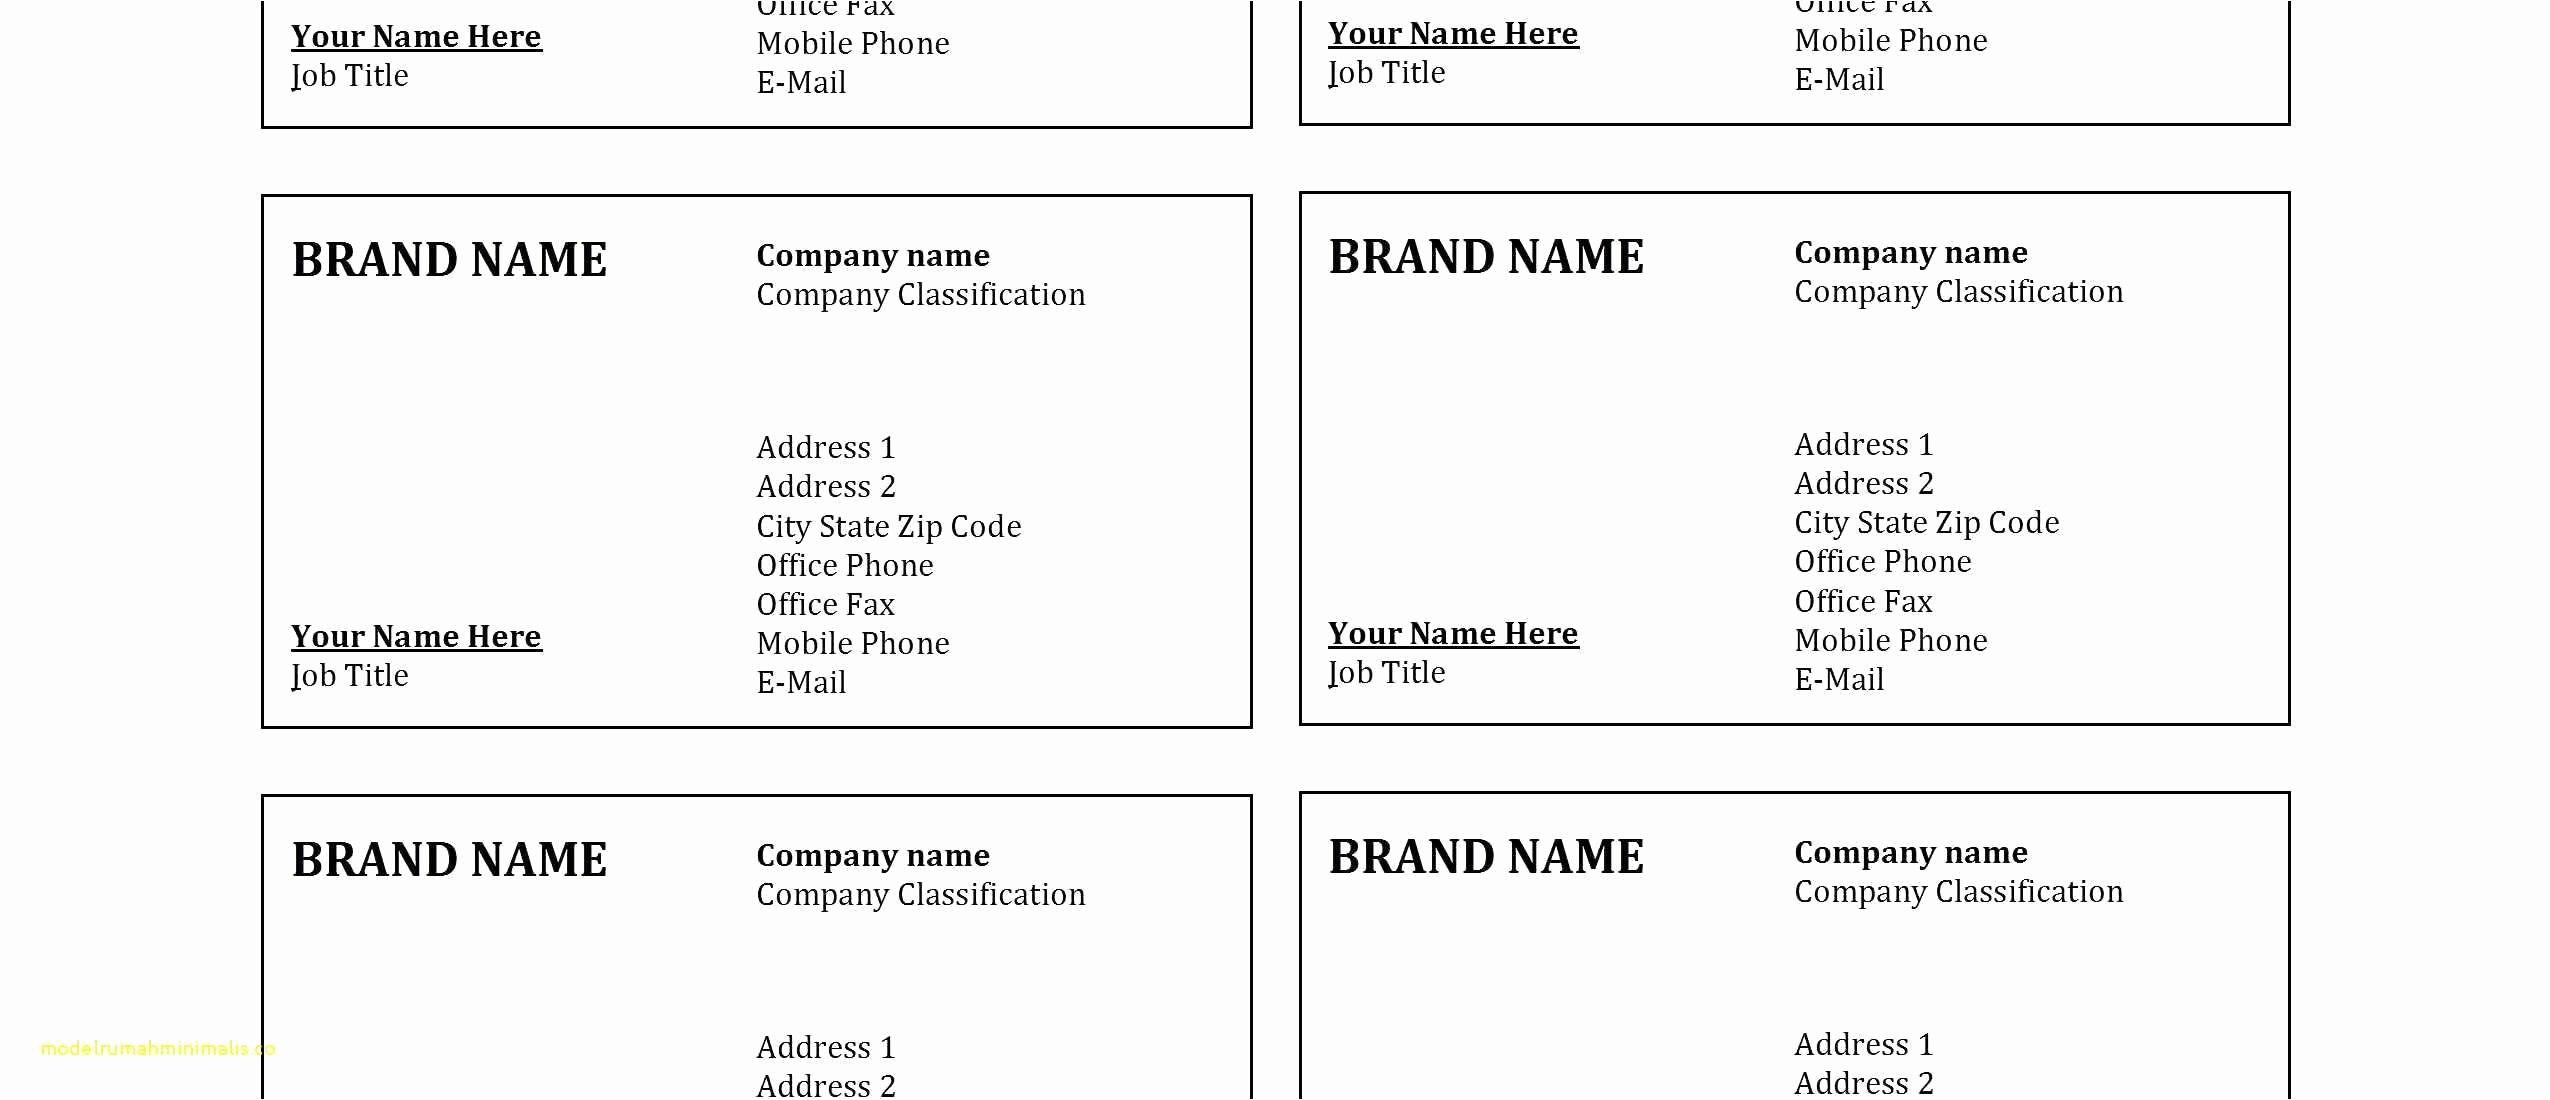 Gartner Studio Templates Unique Gartner Studios Business Card Regarding Gartner Business Cards Template